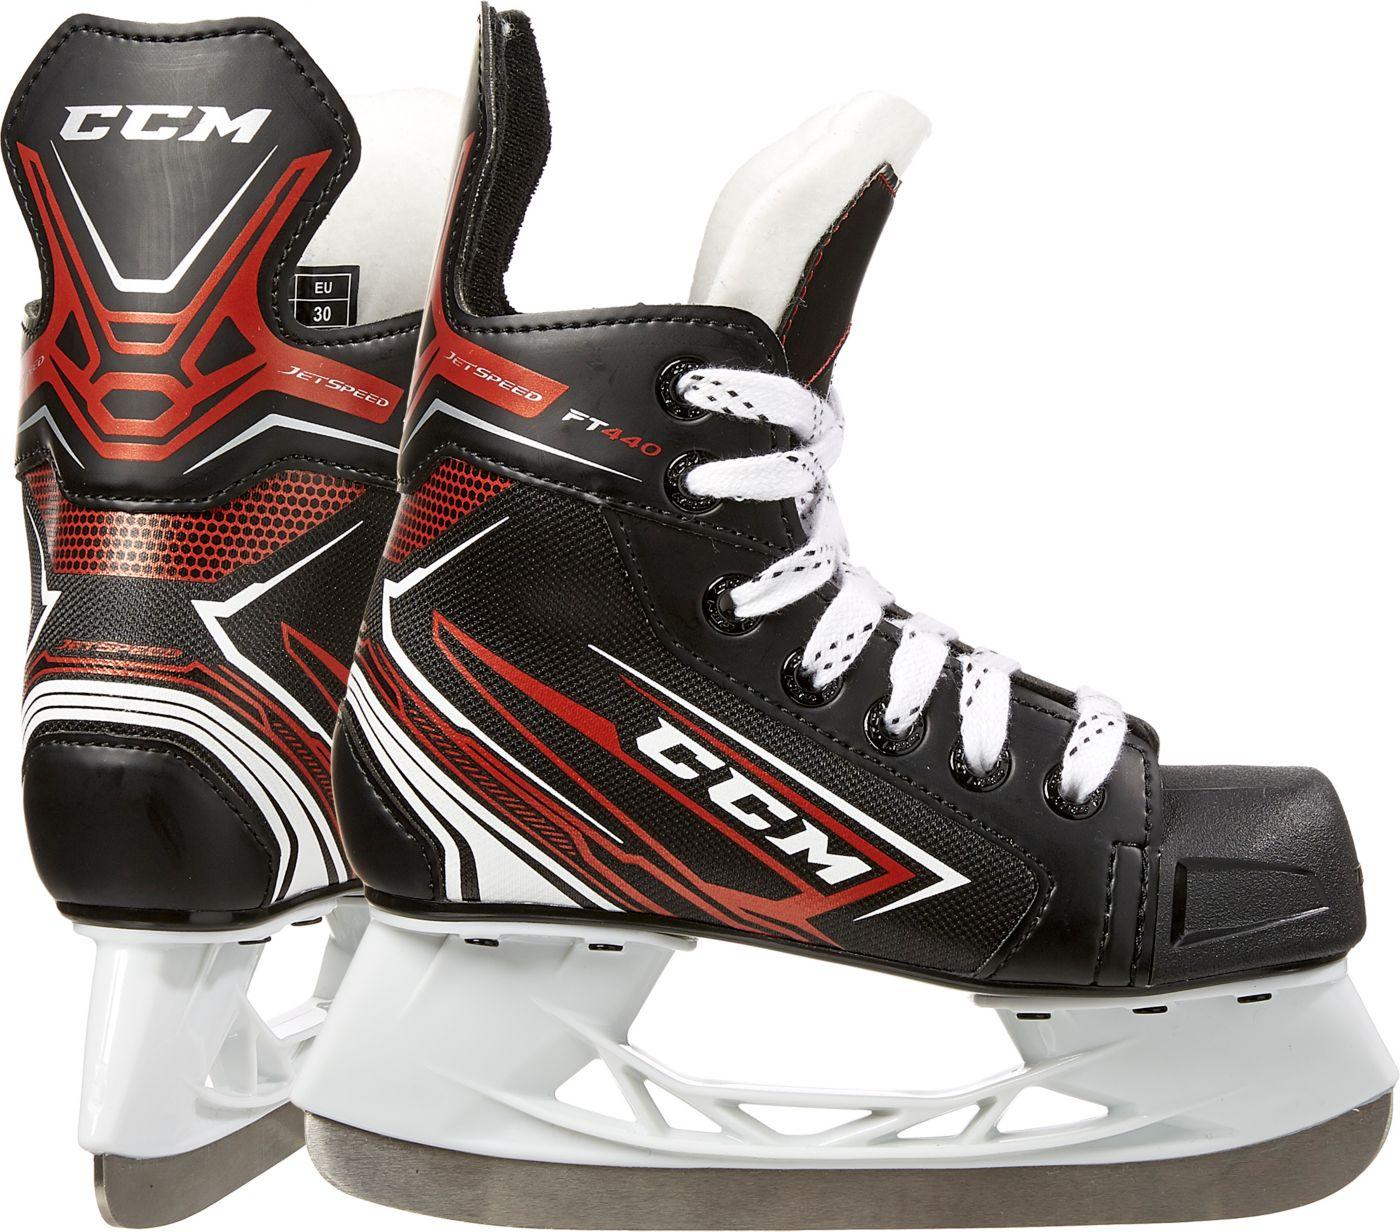 CCM Junior Jet Speed SK440 Ice Hockey Skates